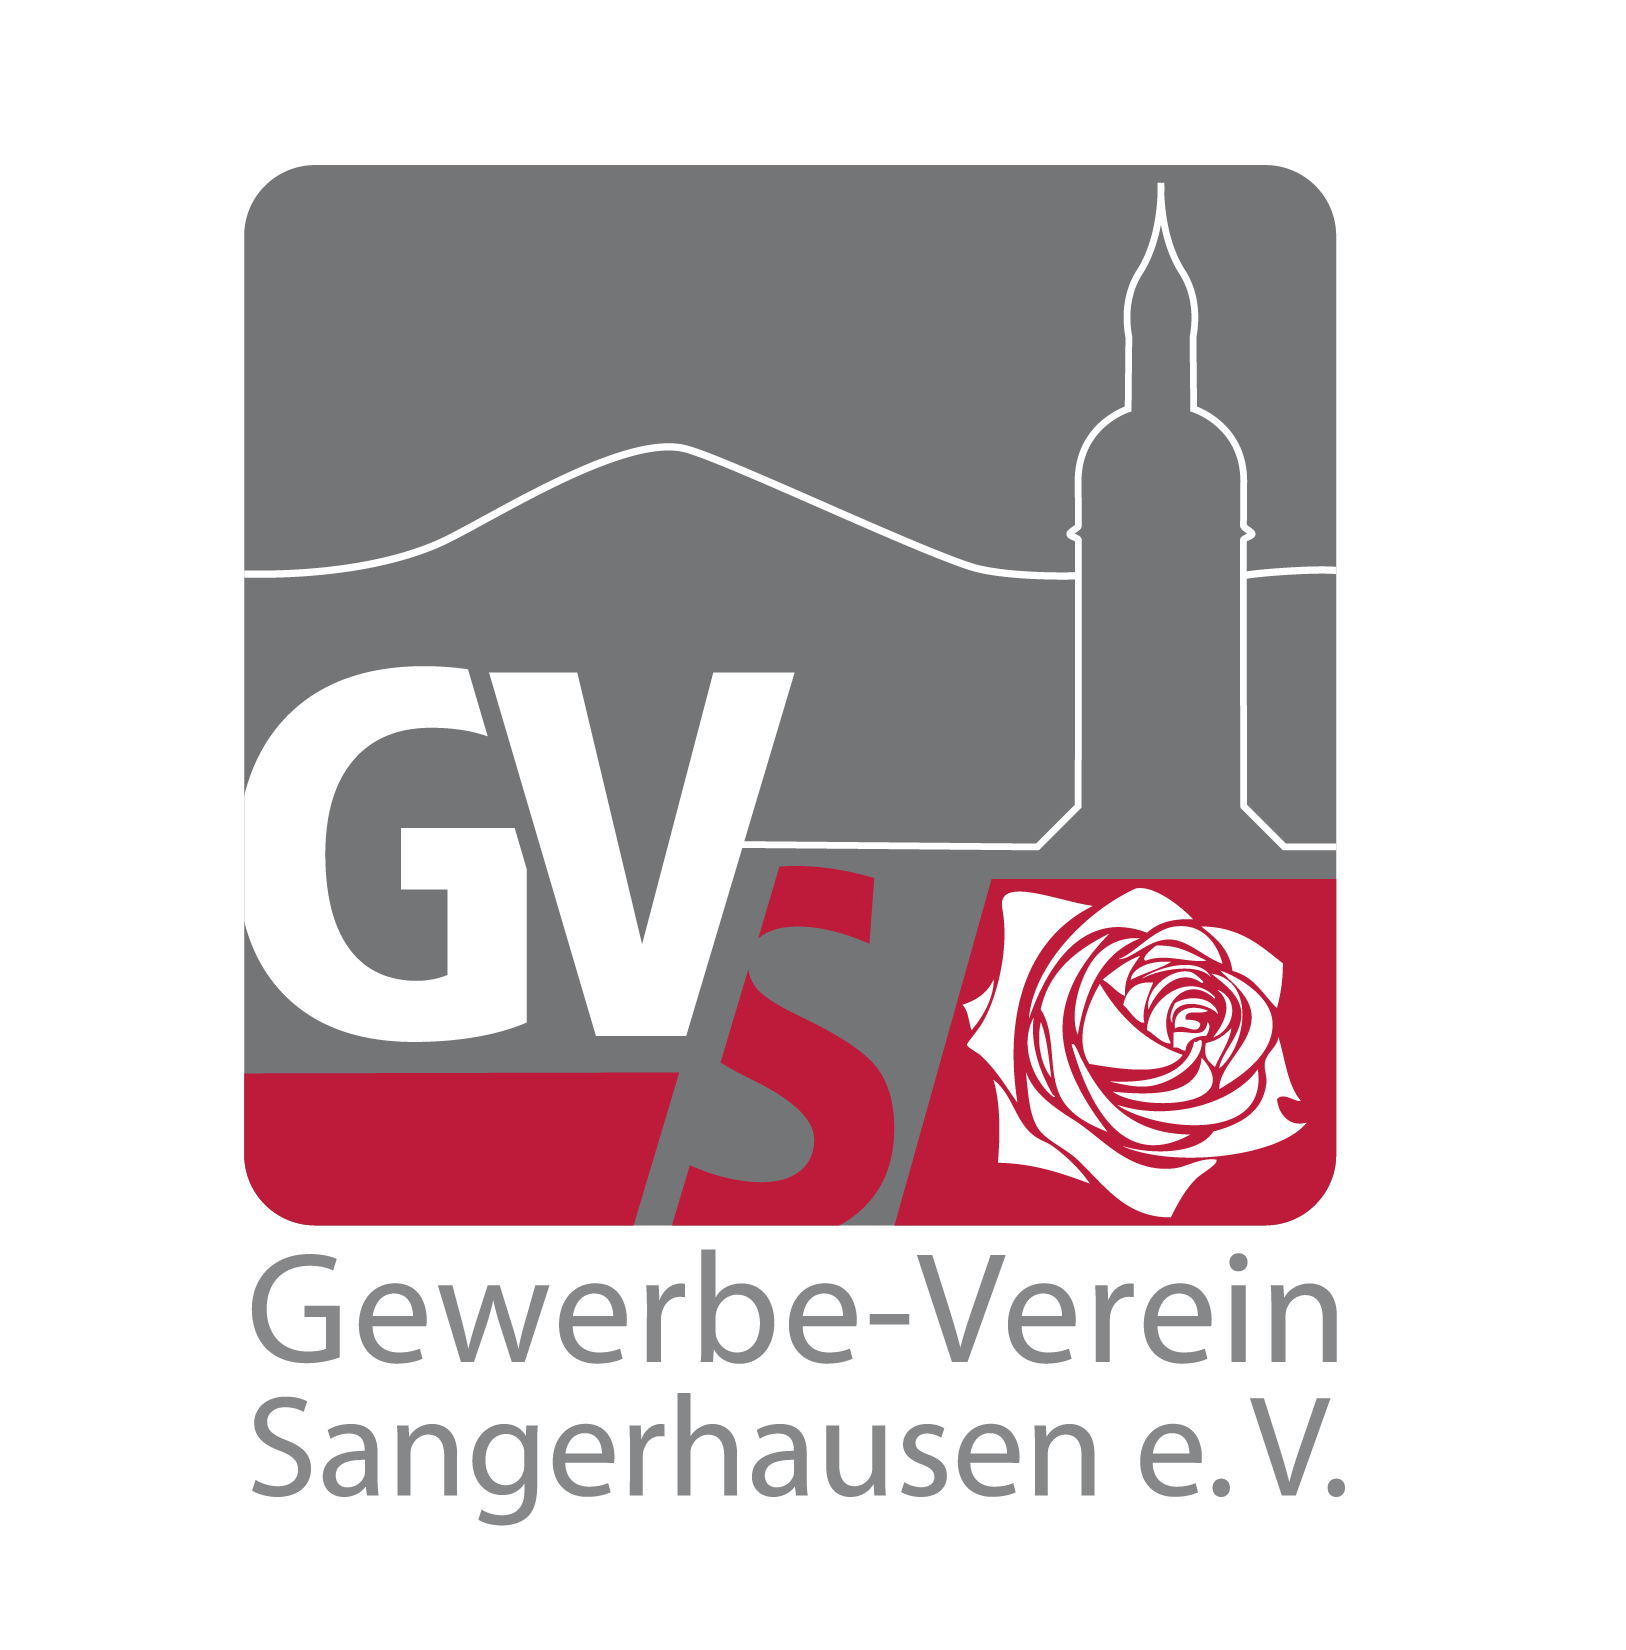 Gewerbeverein Sangerhausen e.V